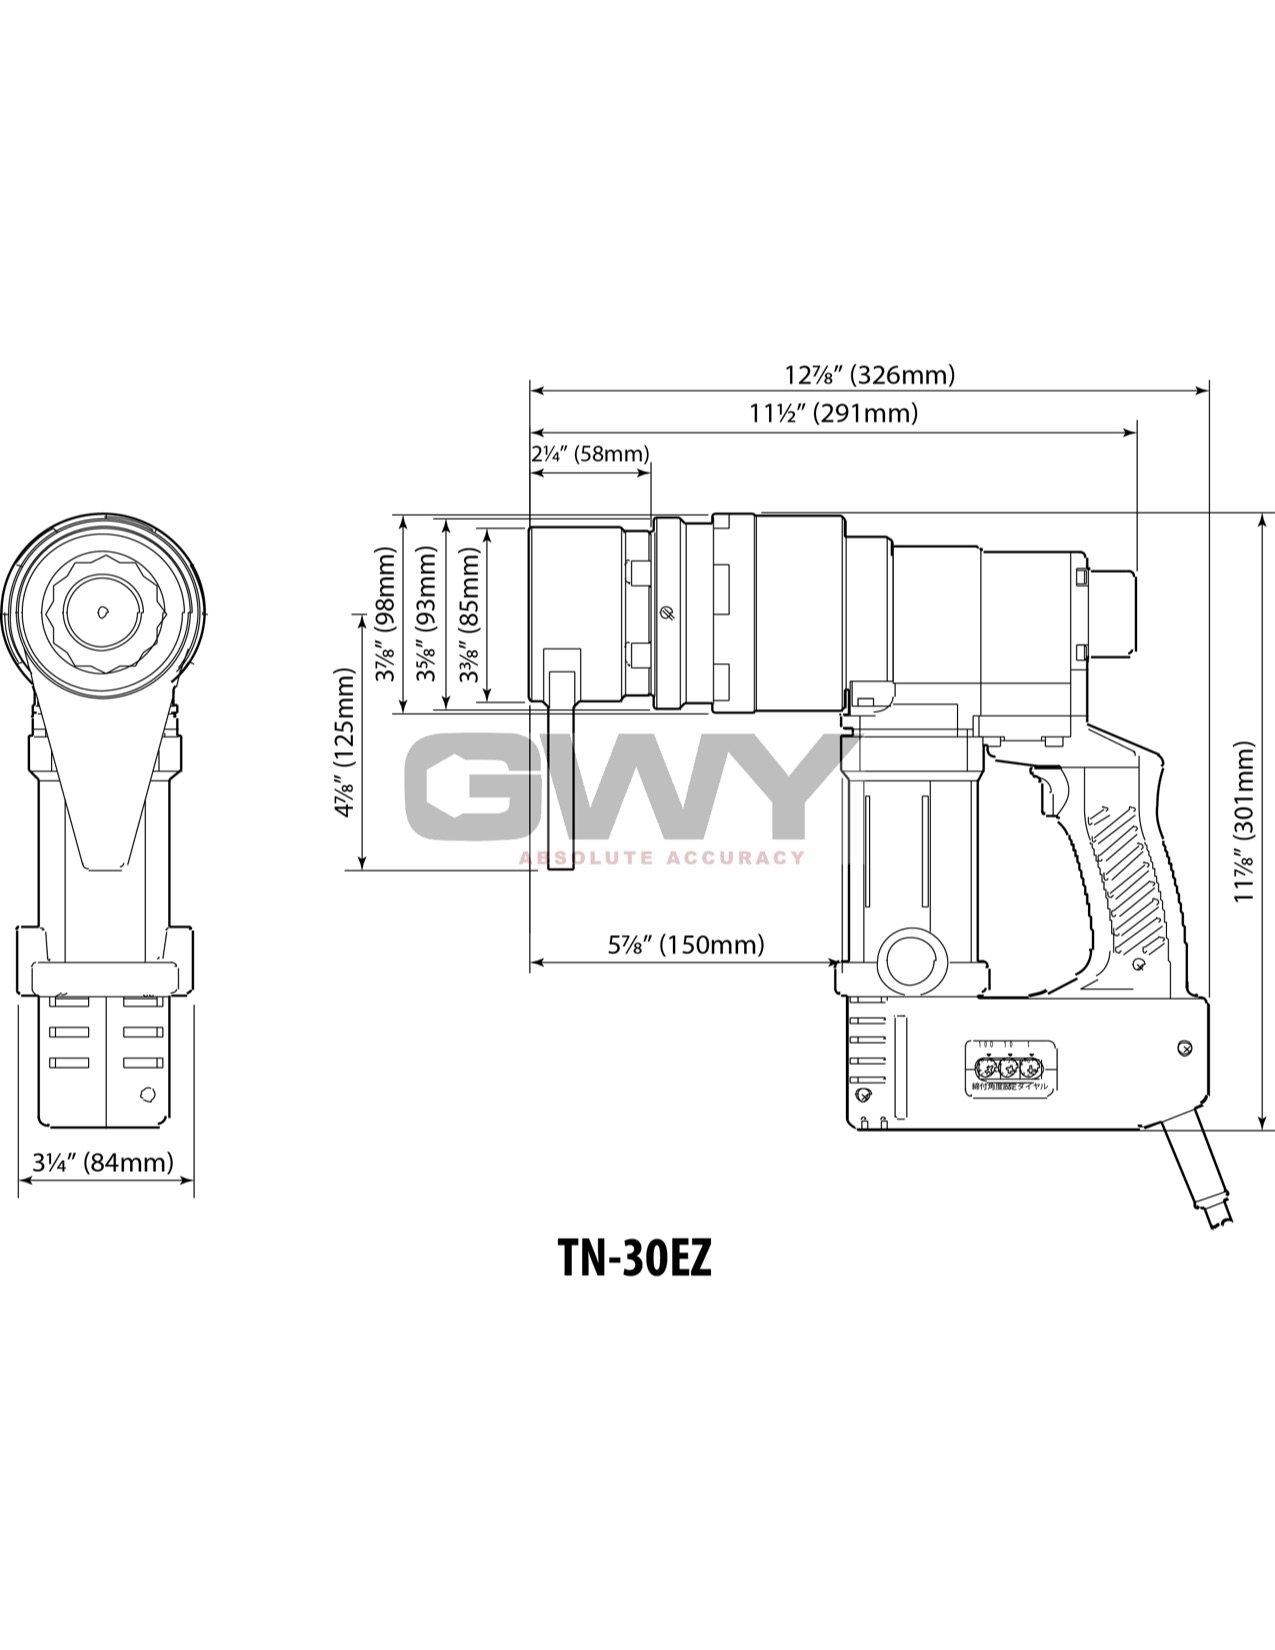 hight resolution of ez wiring 21 circuit harness diagram imageresizertool com ez wiring harness diagram ez wiring 12 circuit schematic